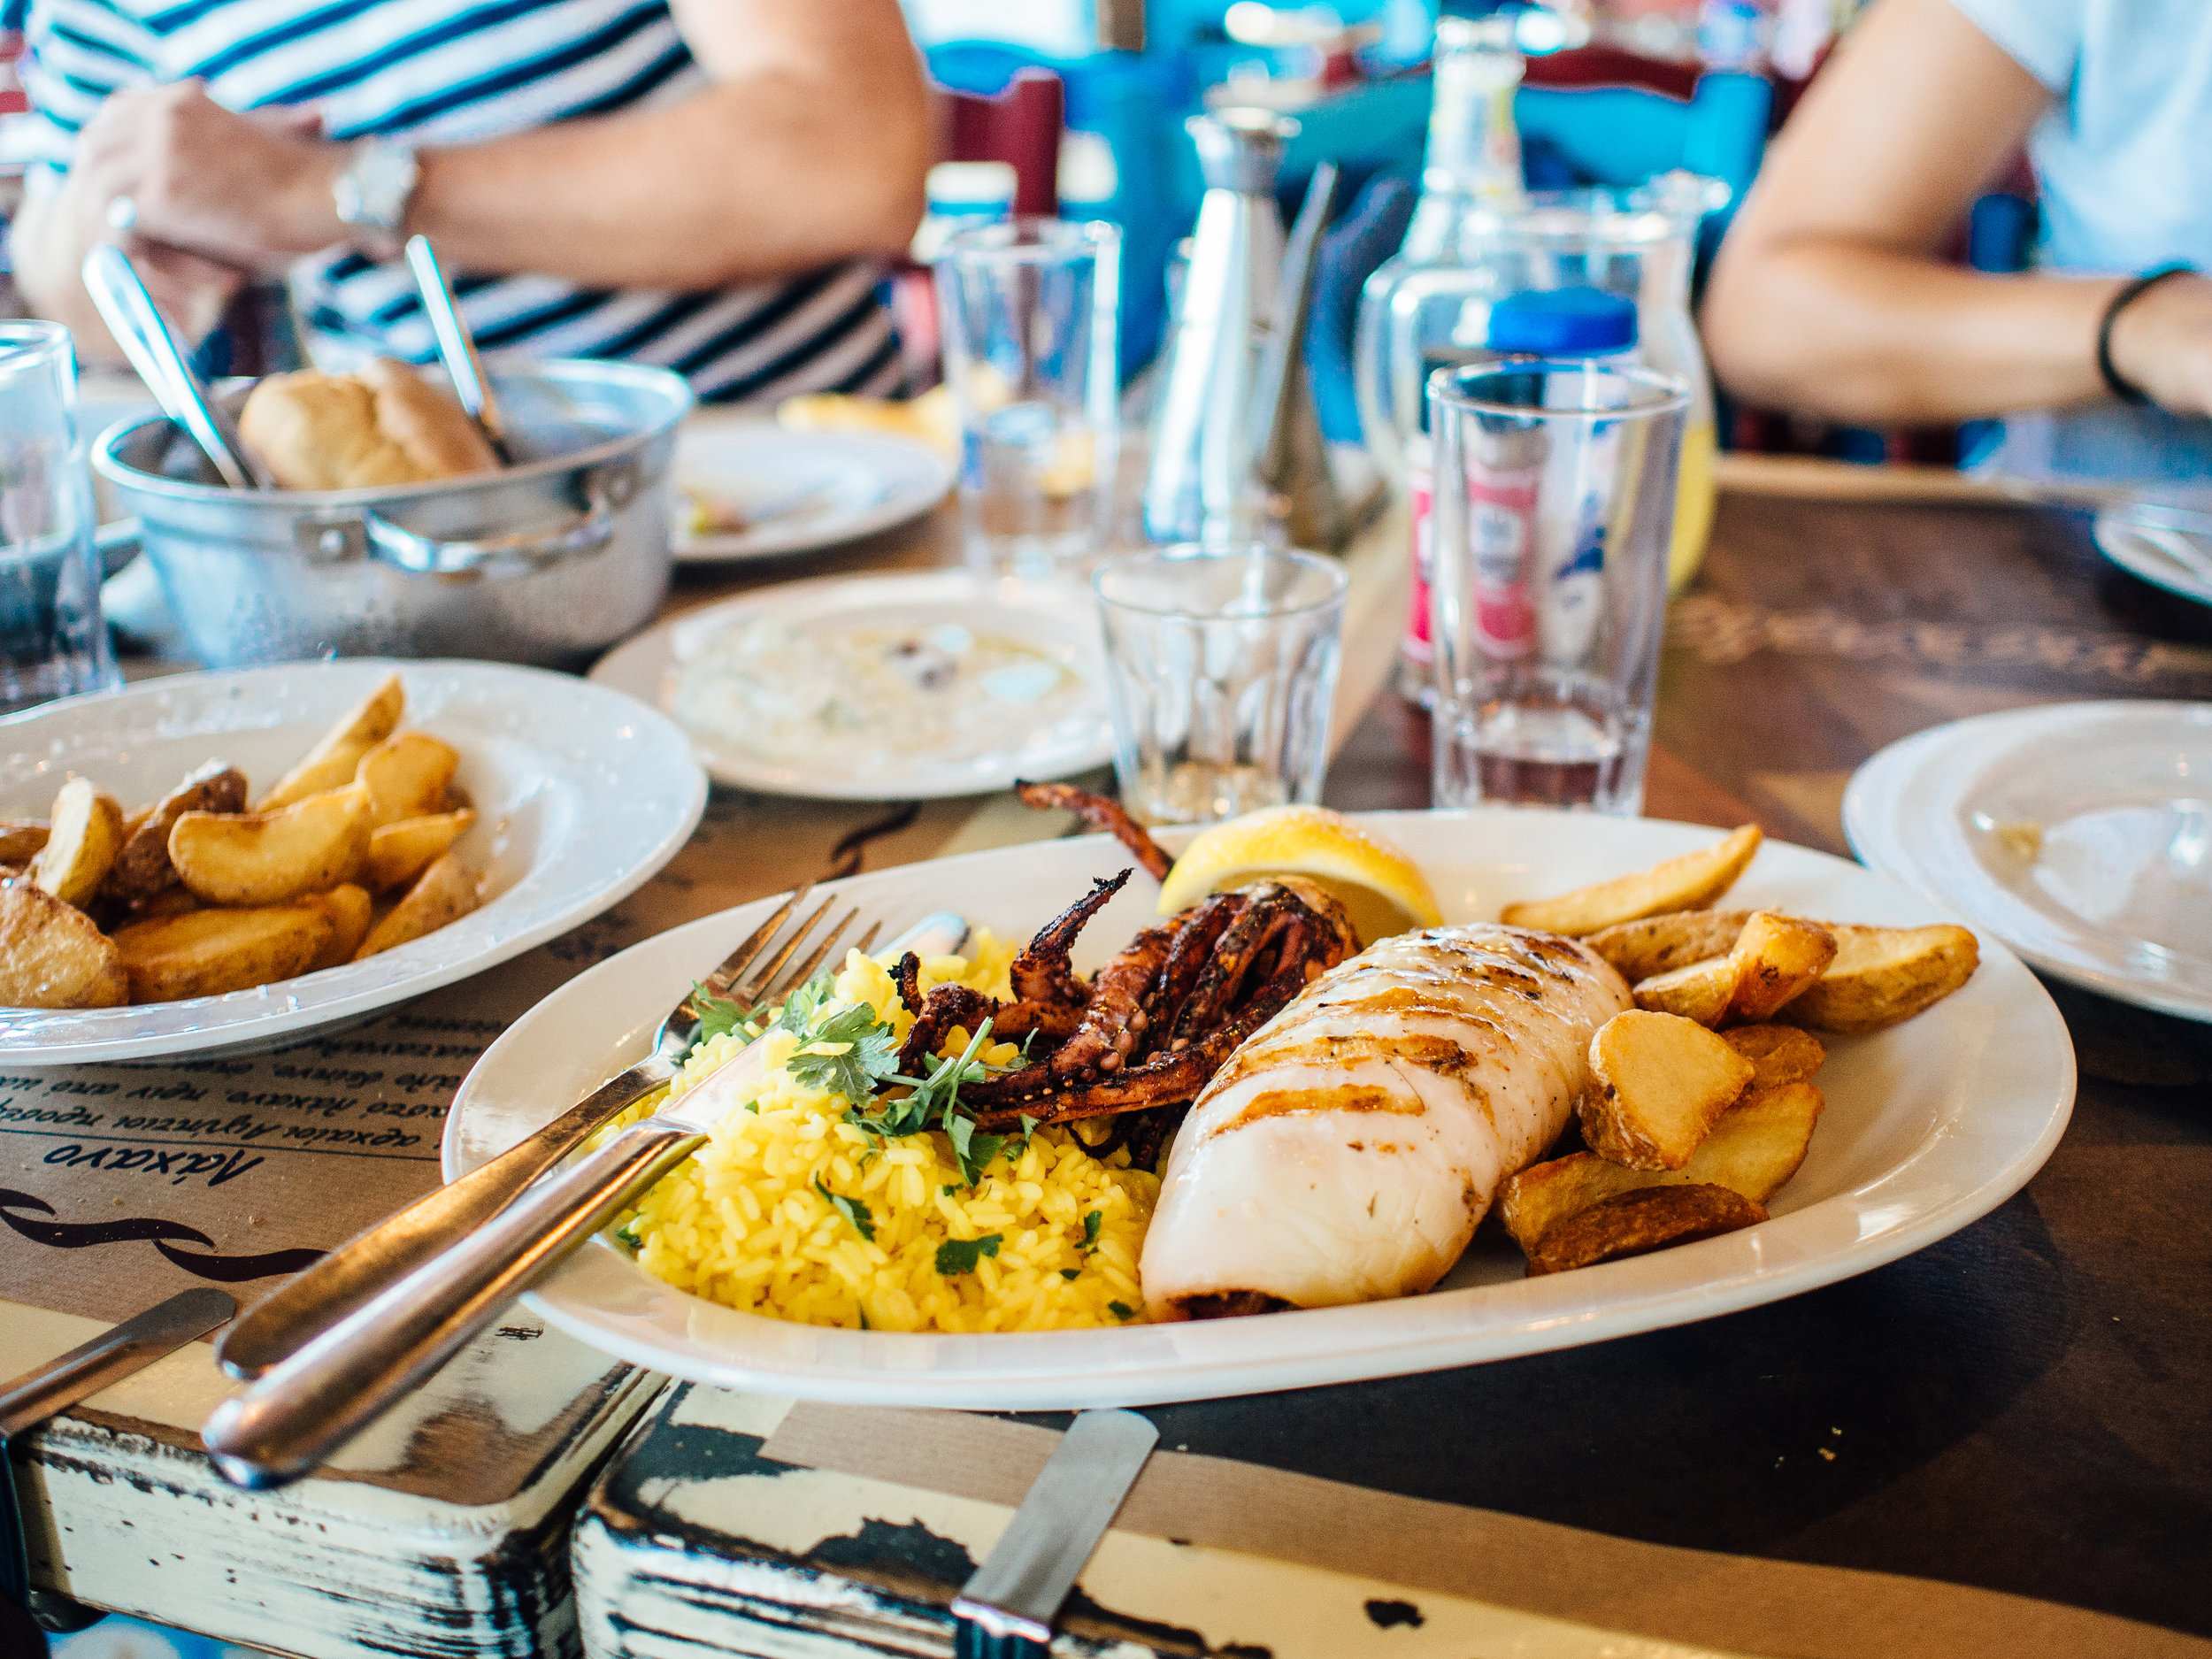 food-plate-restaurant-eating.jpg